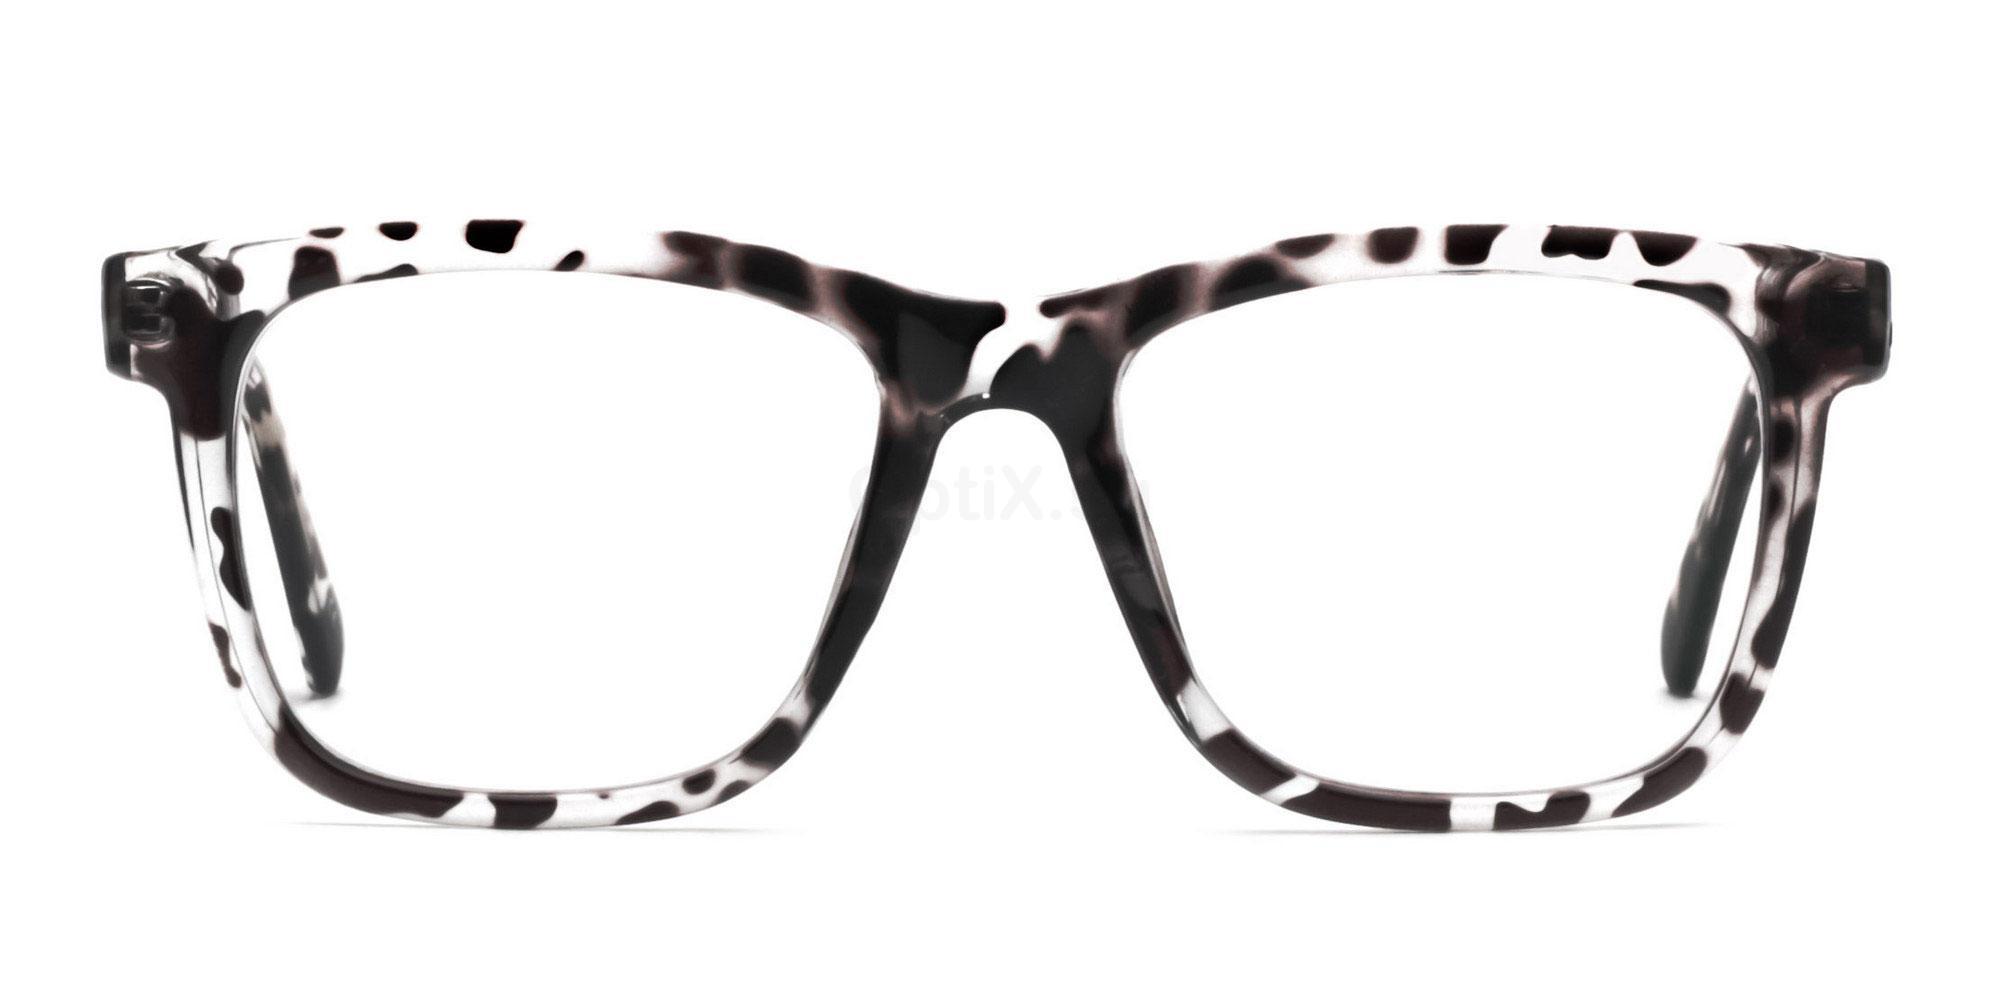 COL.03 2444 - Animal Print Glasses, Savannah